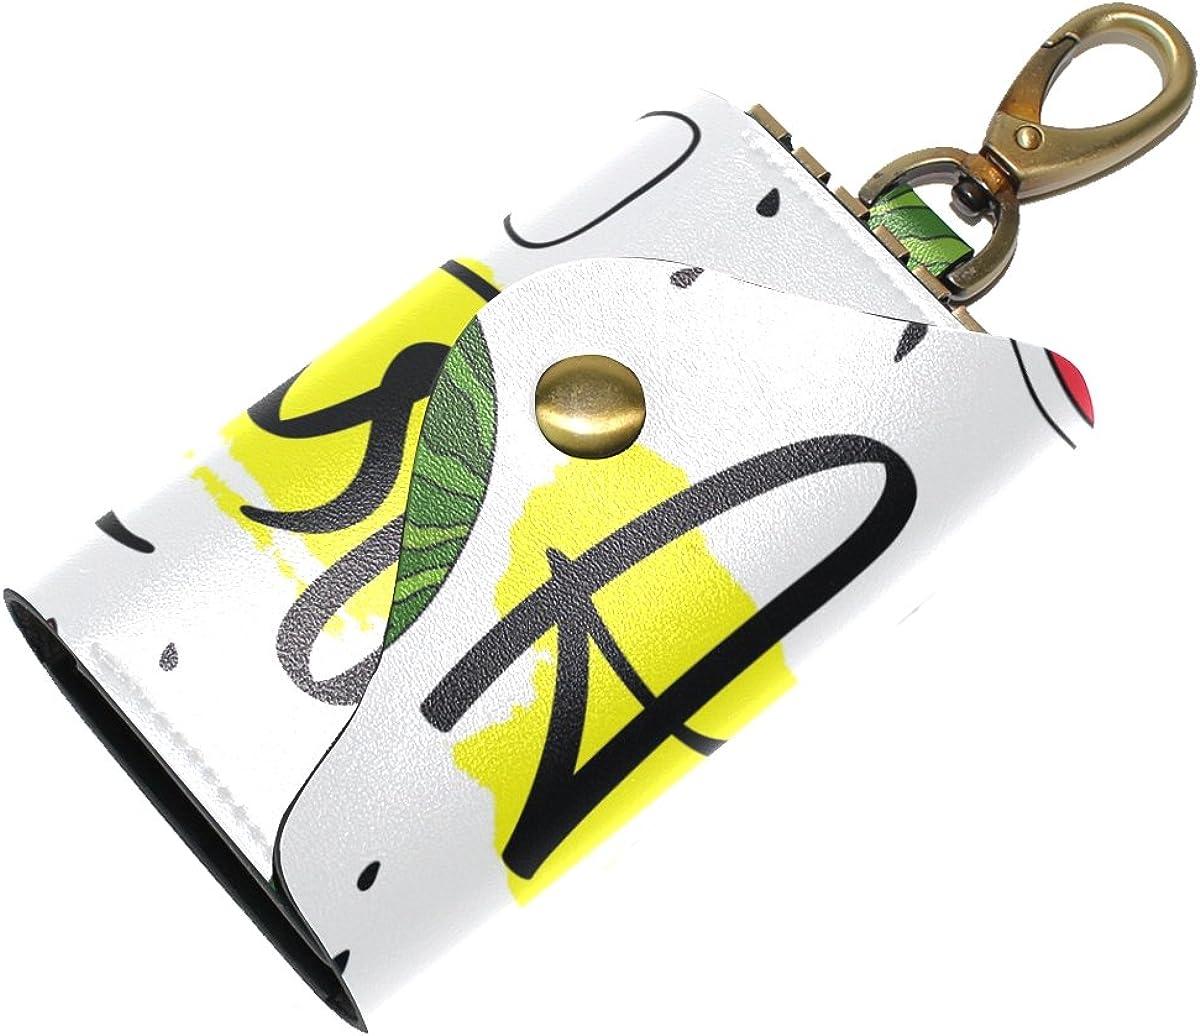 DEYYA Vintage Ancient Egyptian Leather Key Case Wallets Unisex Keychain Key Holder with 6 Hooks Snap Closure